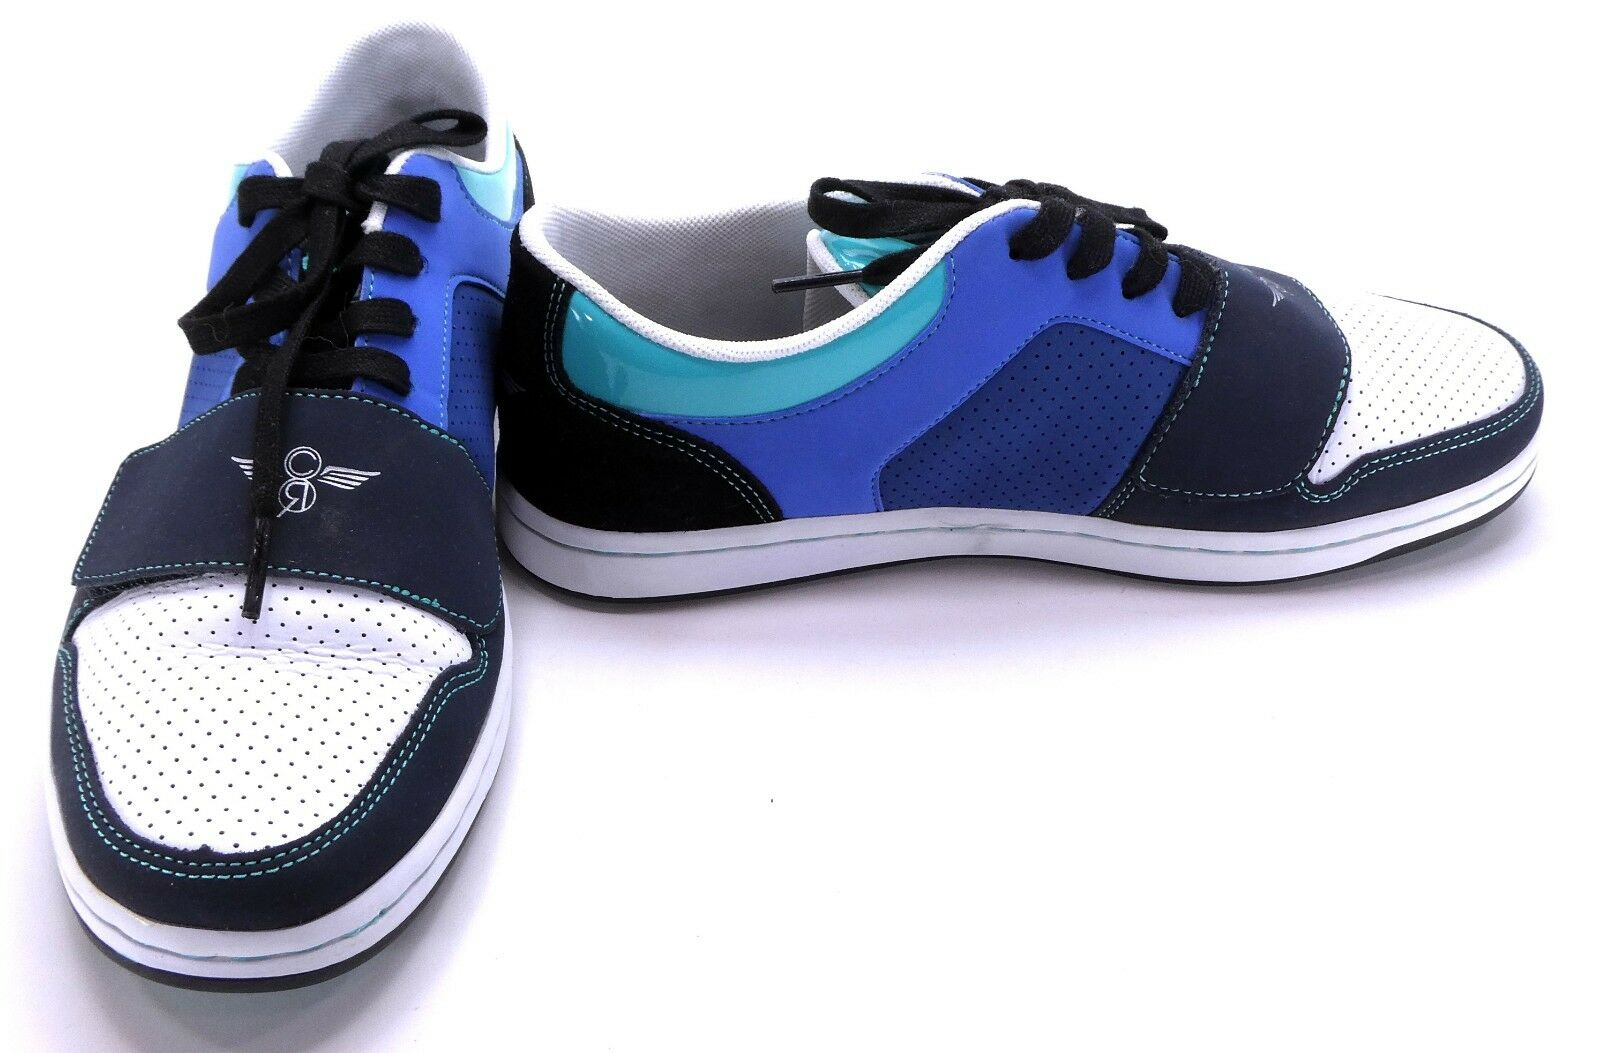 Creative Recreation Chaussures Cesario Lo Bleu/Noir/Aqua Sneakers